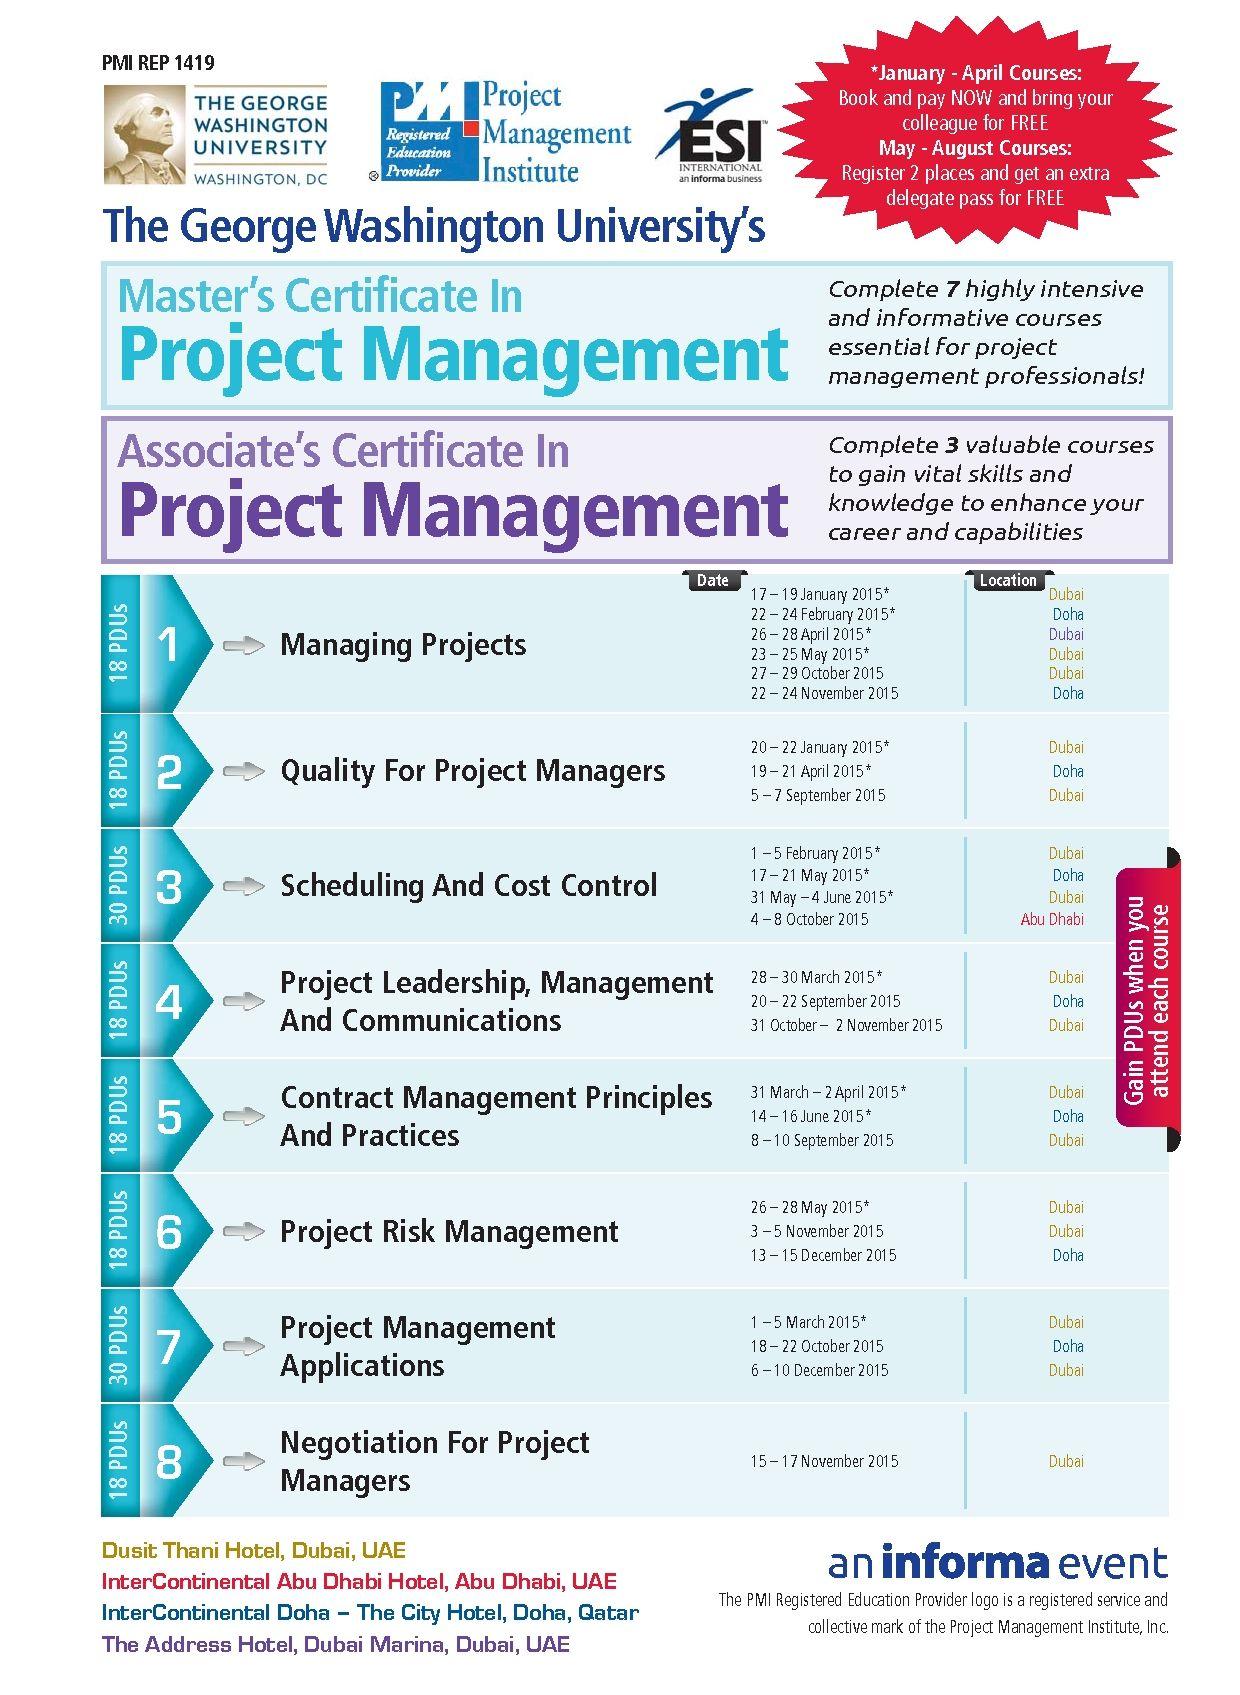 Informa me project management training negotiation for project informa me project management training negotiation for project managers 1betcityfo Images